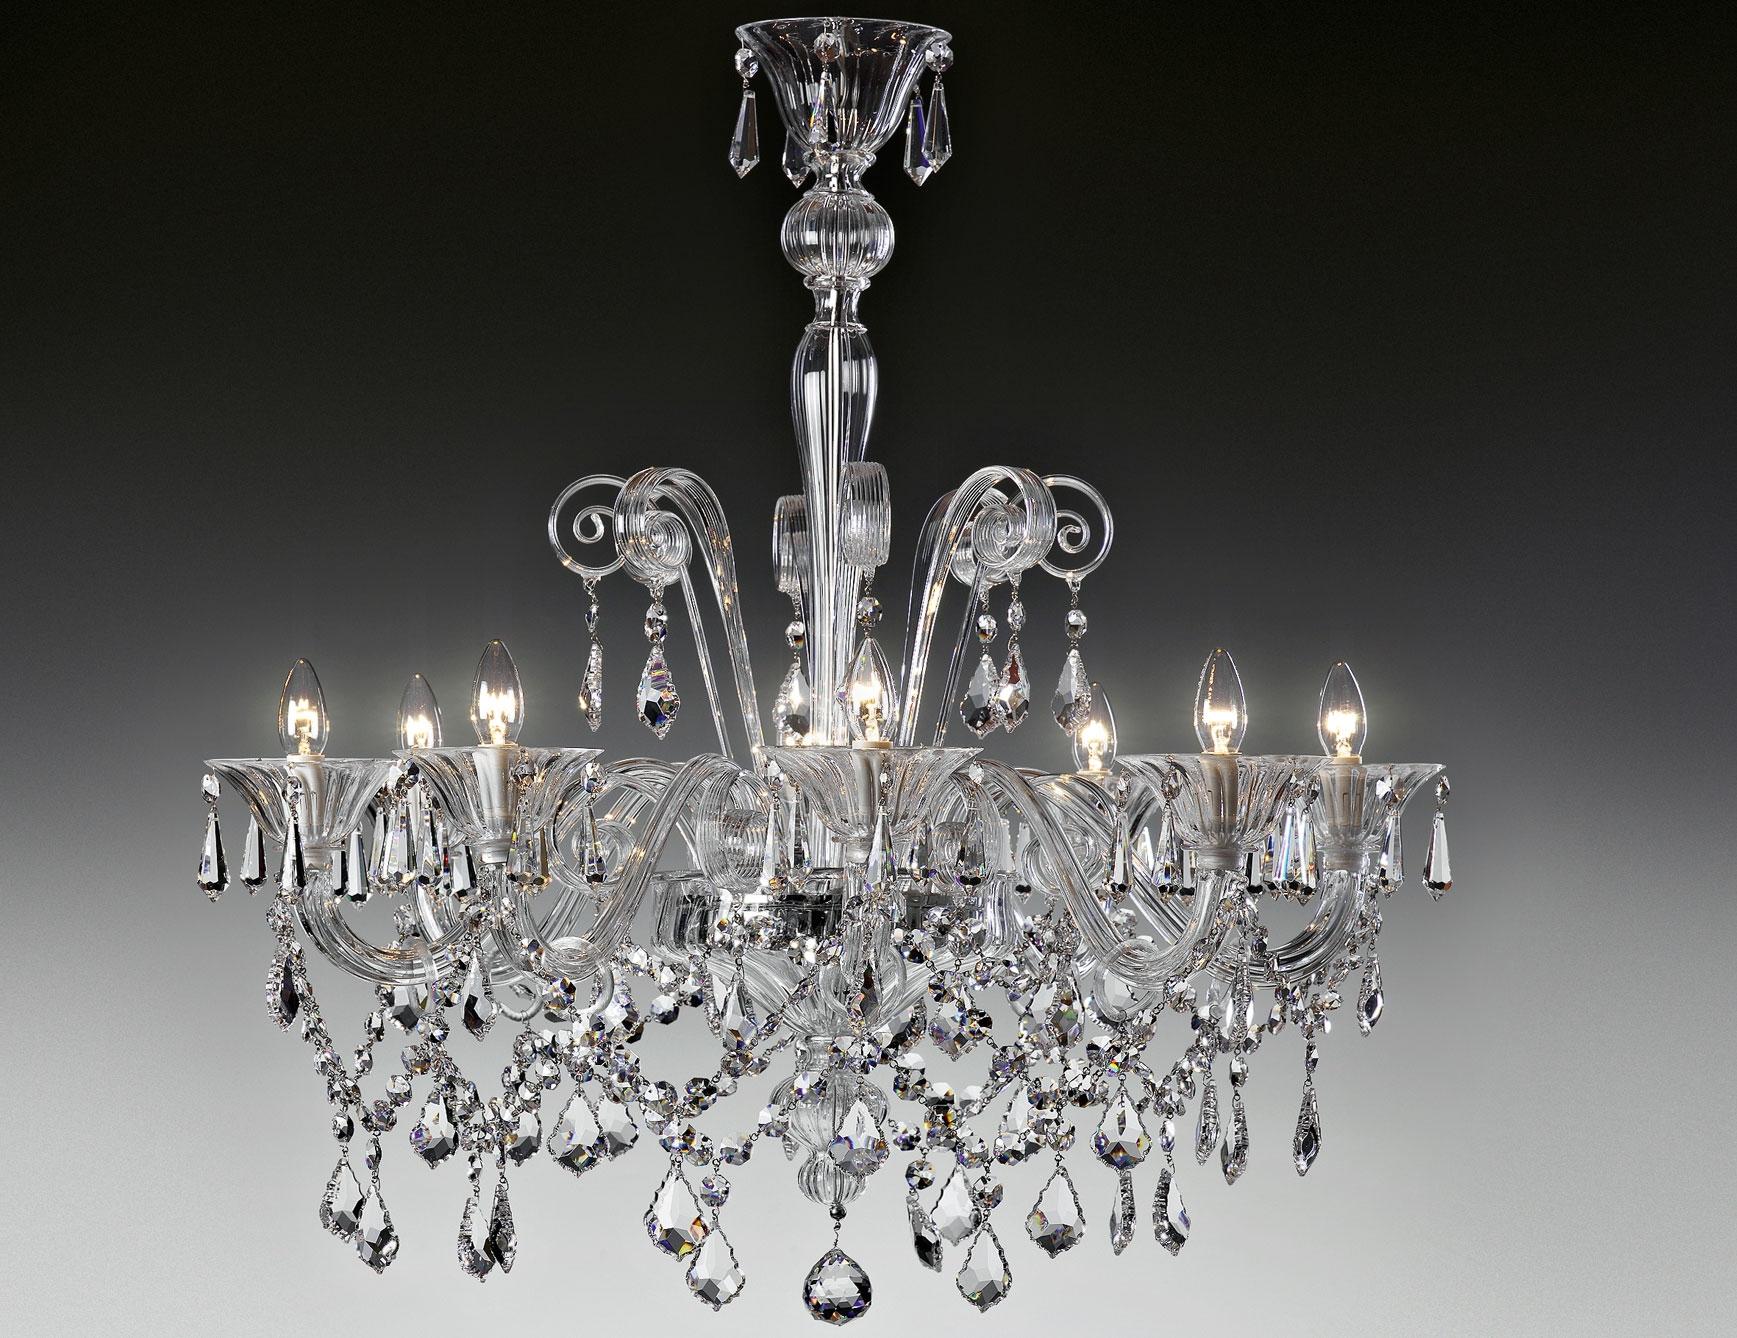 12 inspirations of modern italian chandeliers nella vetrina lulu 9016 8 modern italian chandelier clear murano glass inside modern italian chandeliers arubaitofo Gallery